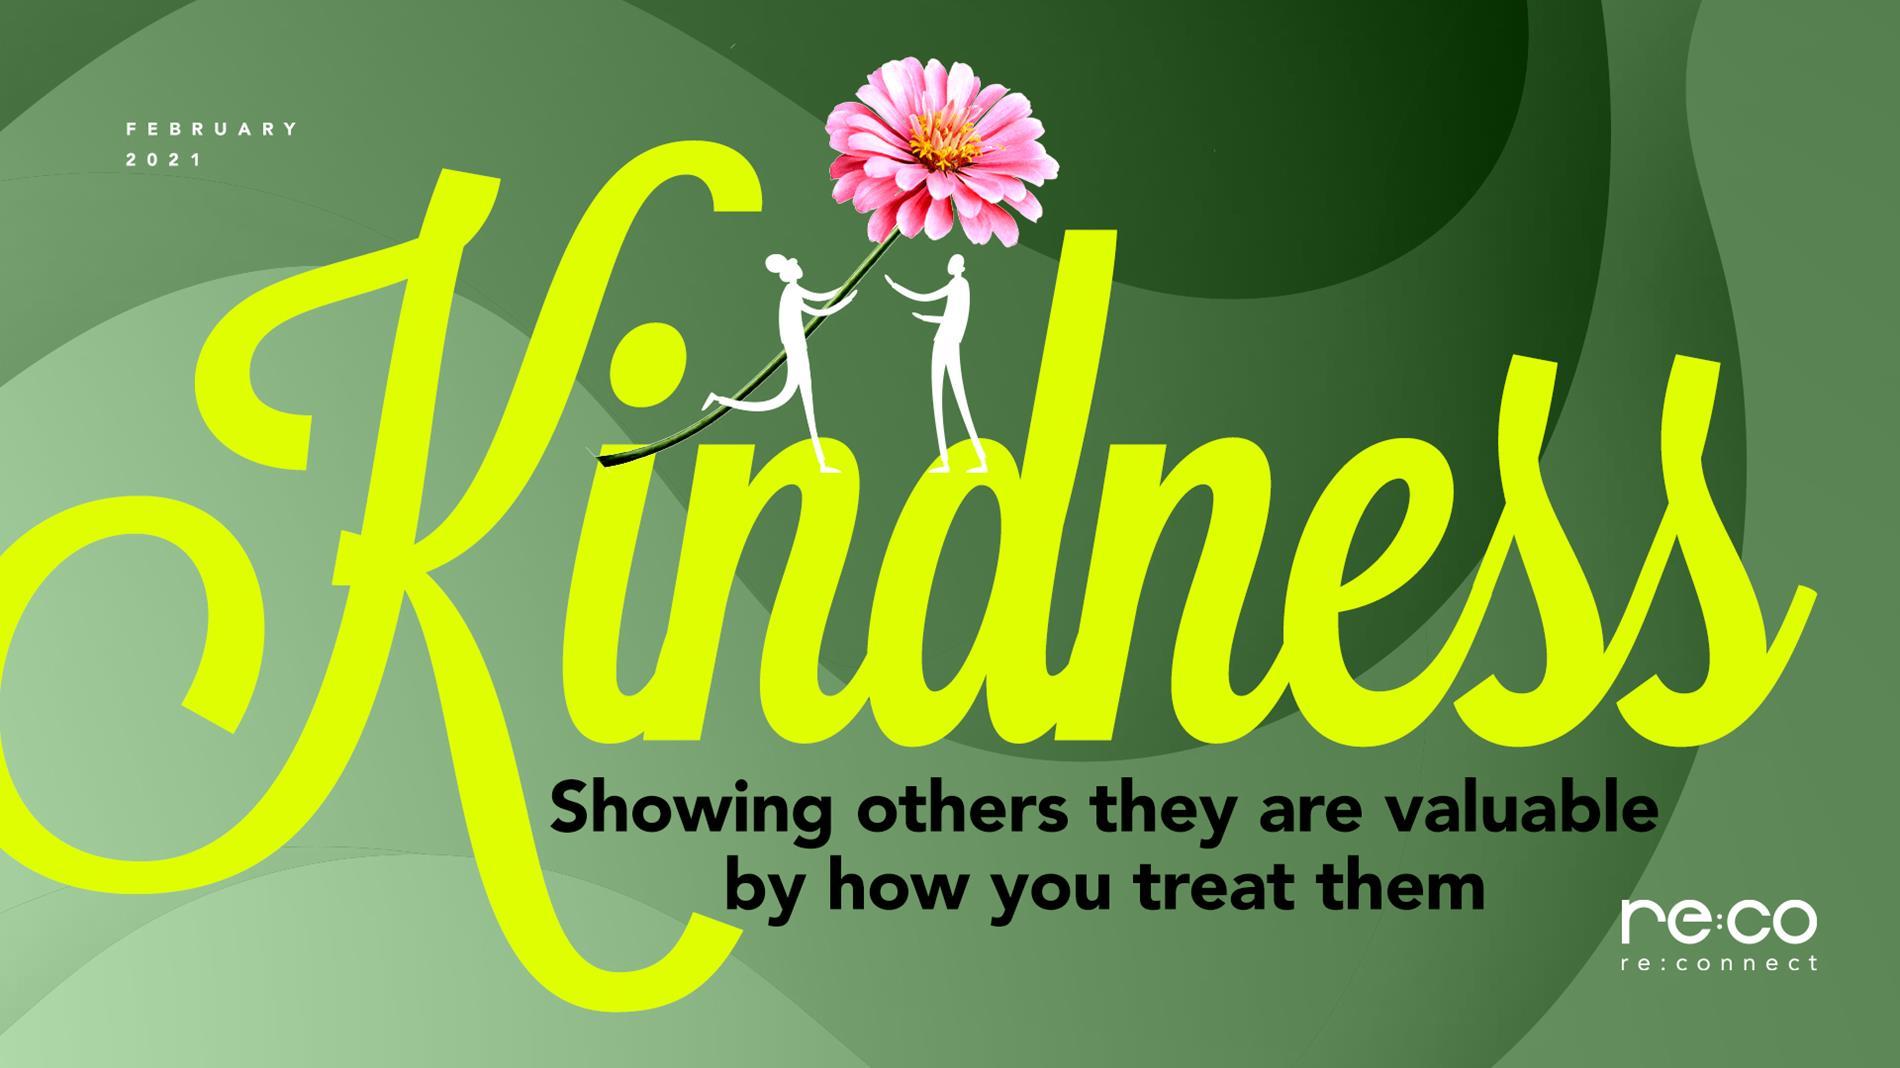 February 2021-Kindness